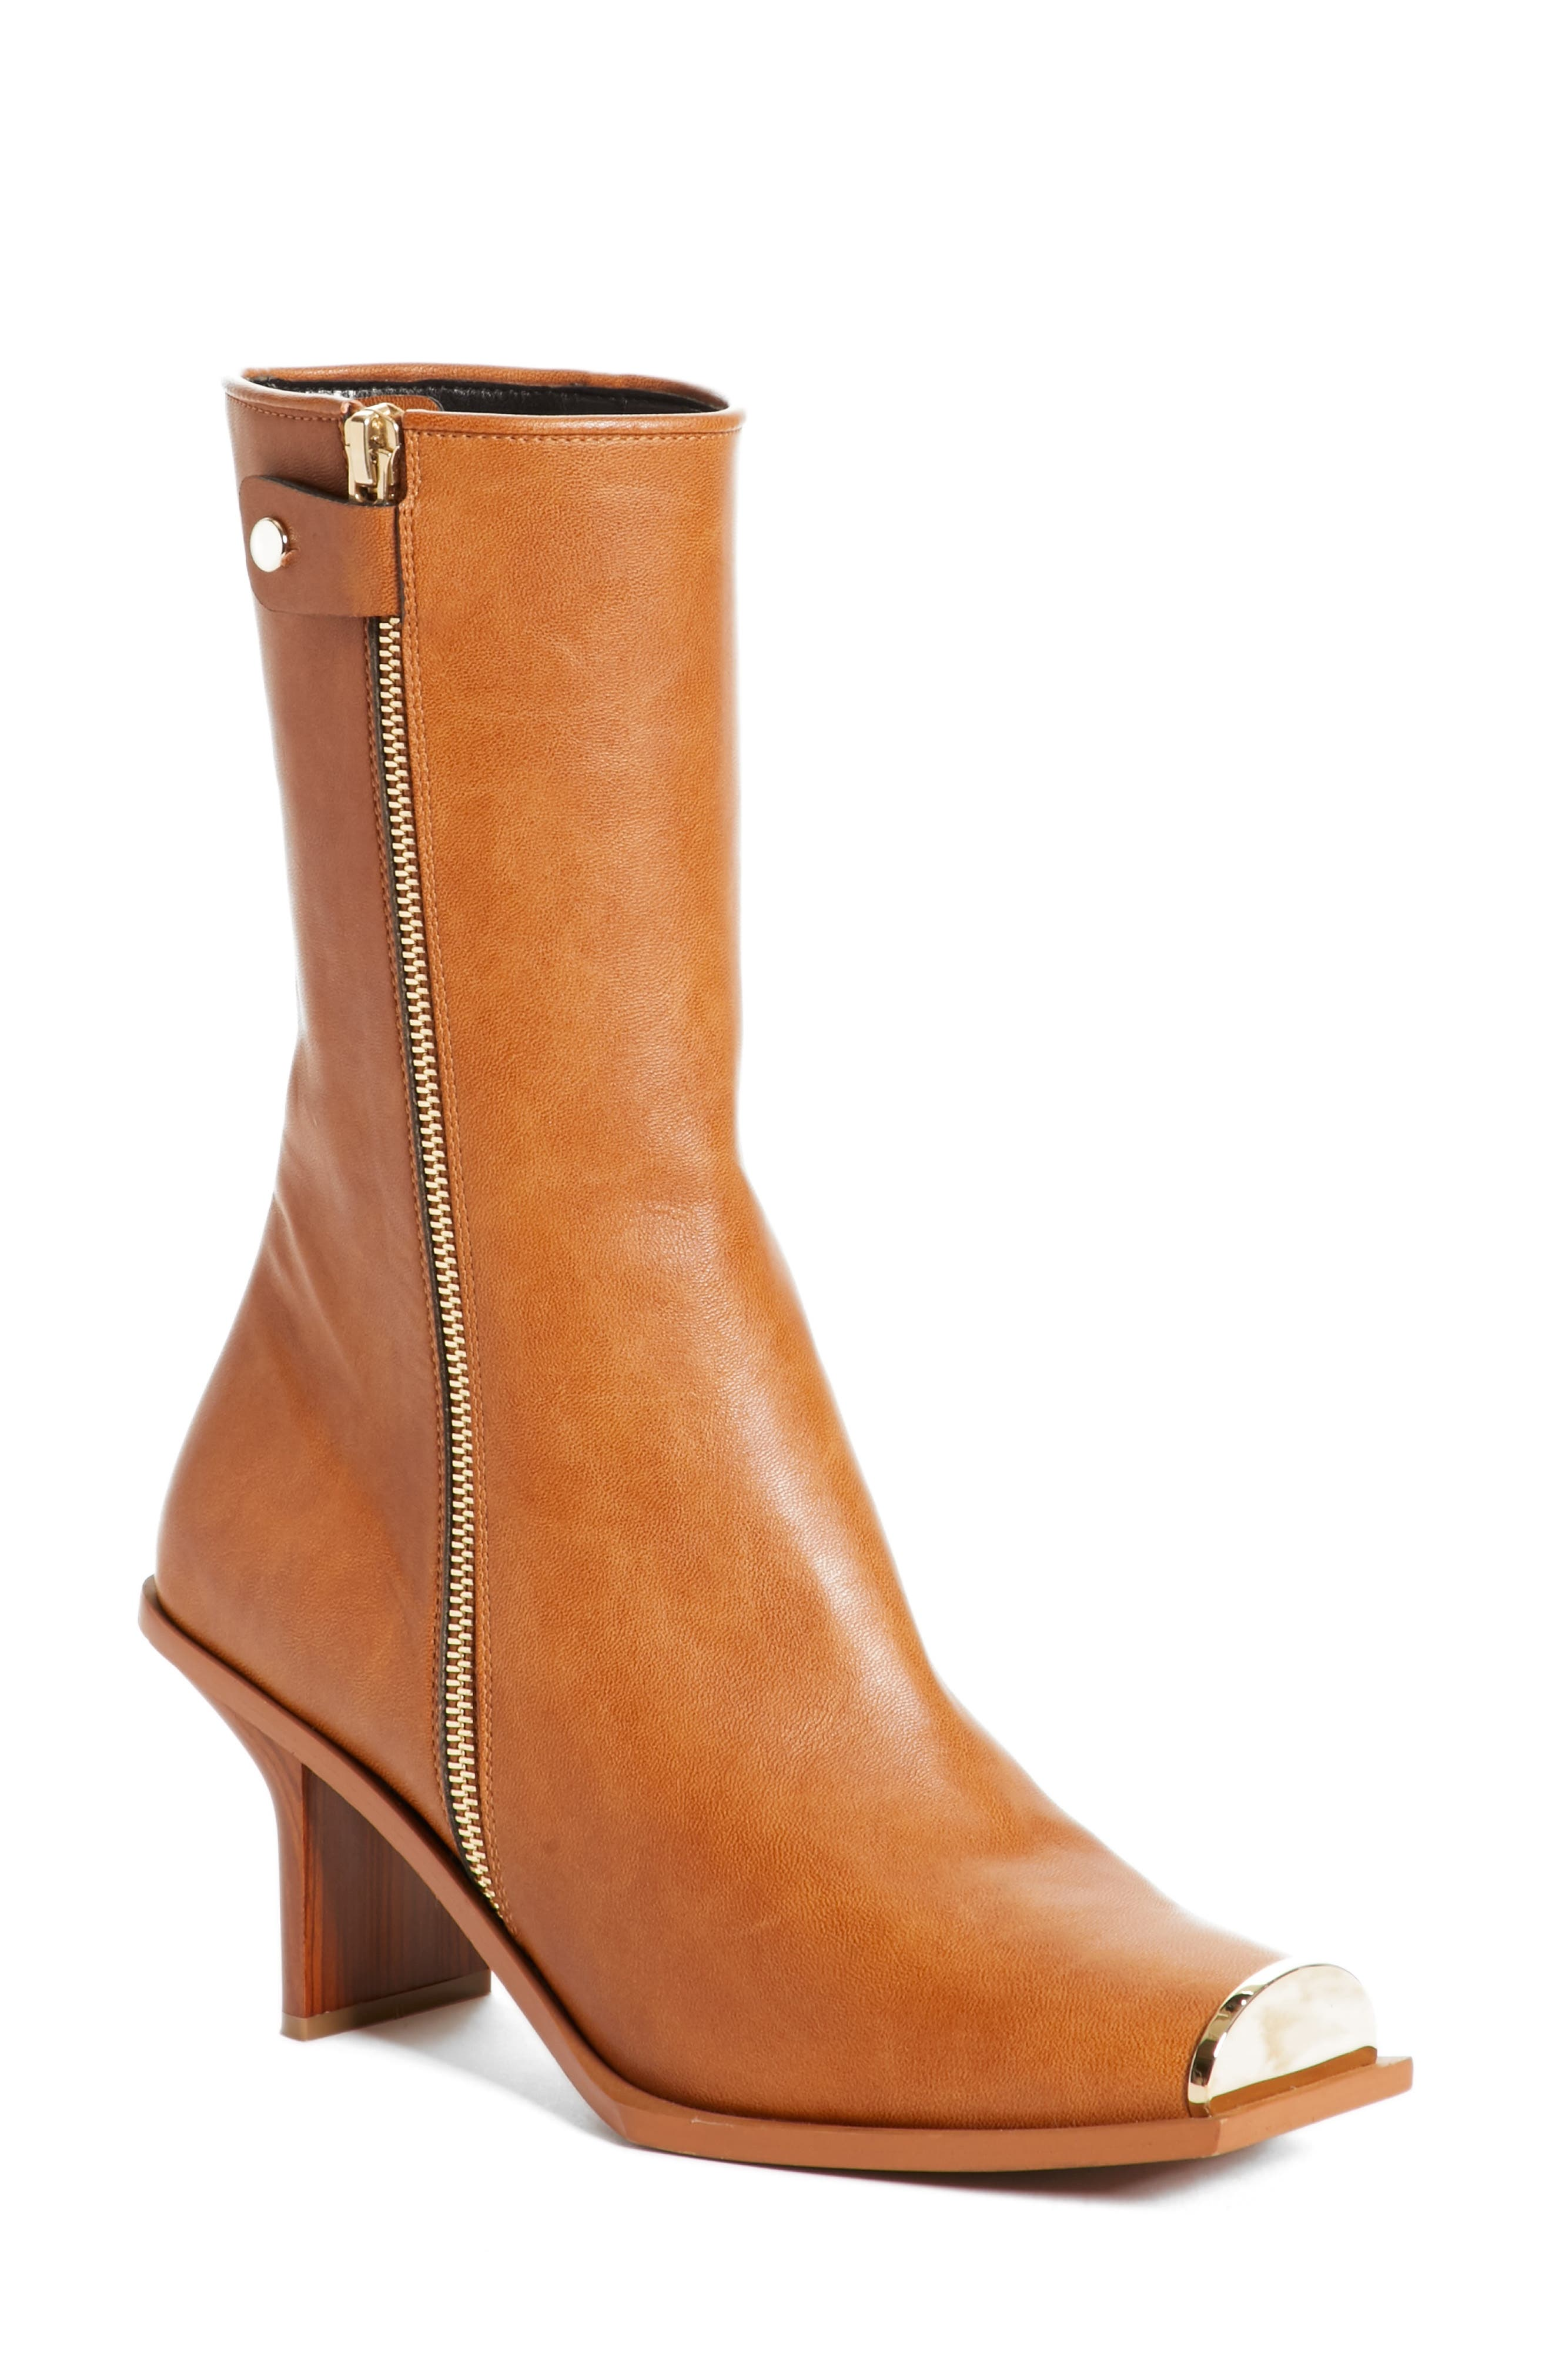 Main Image - Stella McCartney Cap Toe Boot (Women)